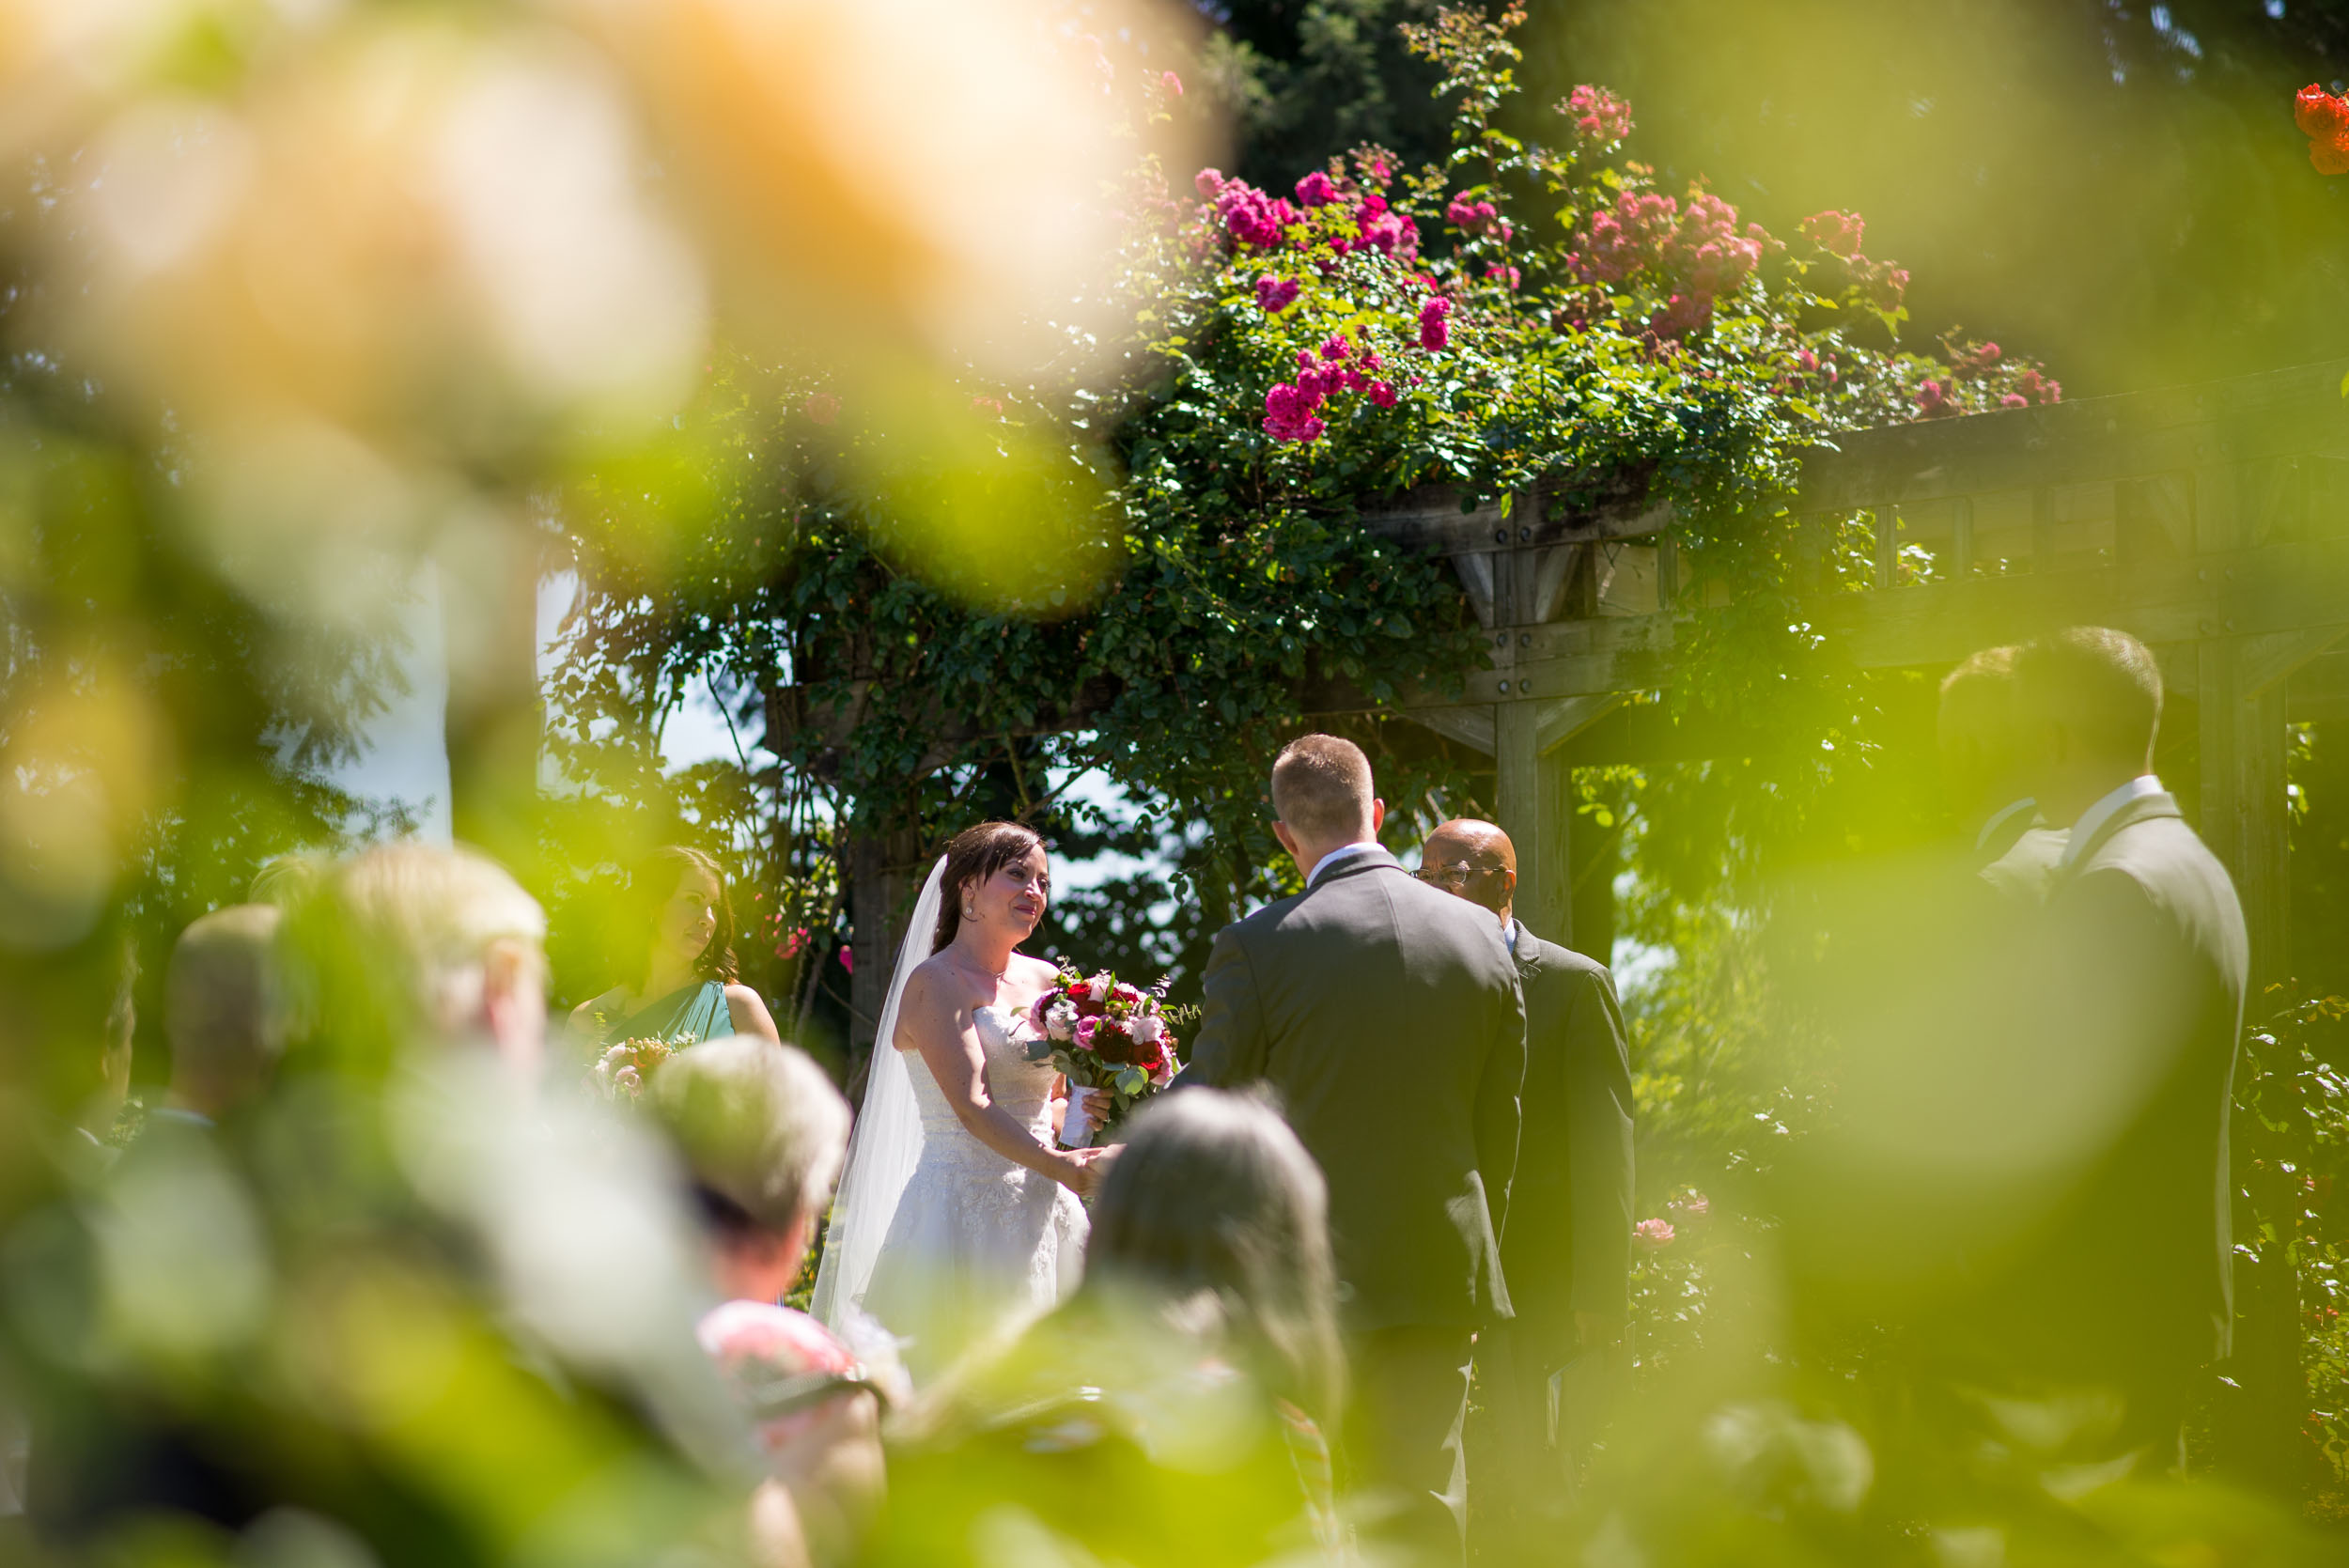 Wedding ceremony in rose garden